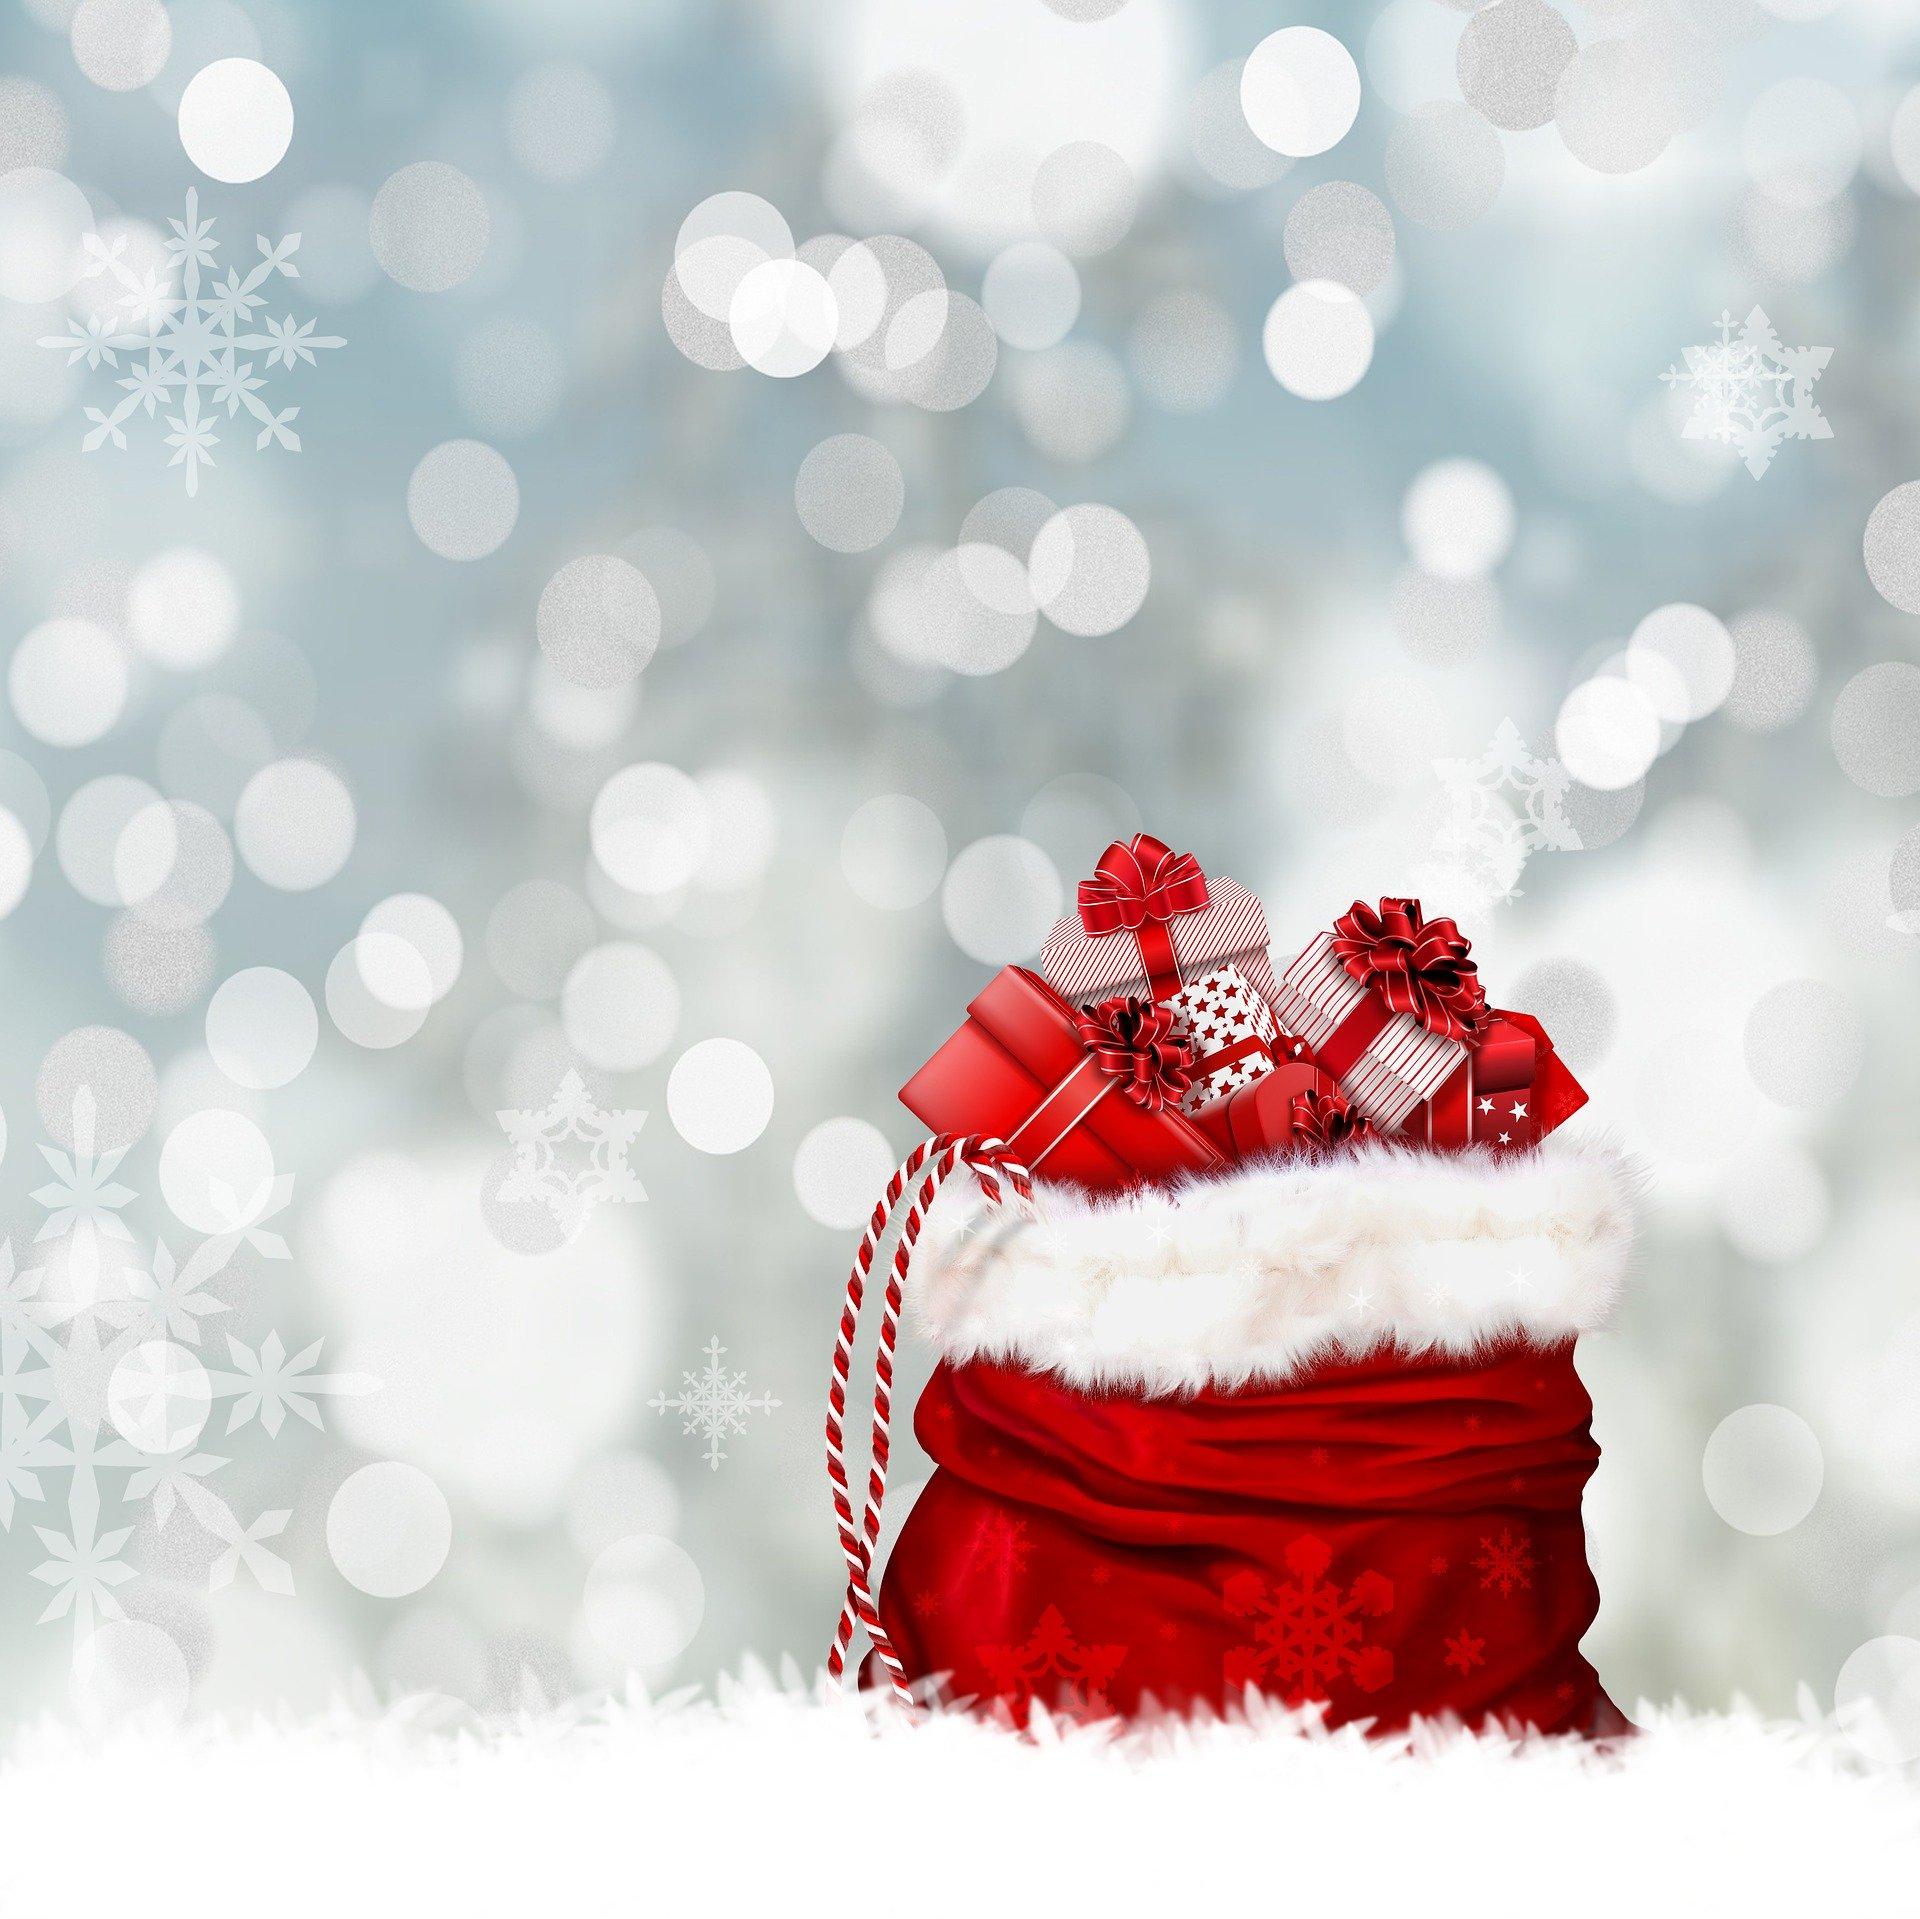 Weihnachtsaktion Walter Sagan